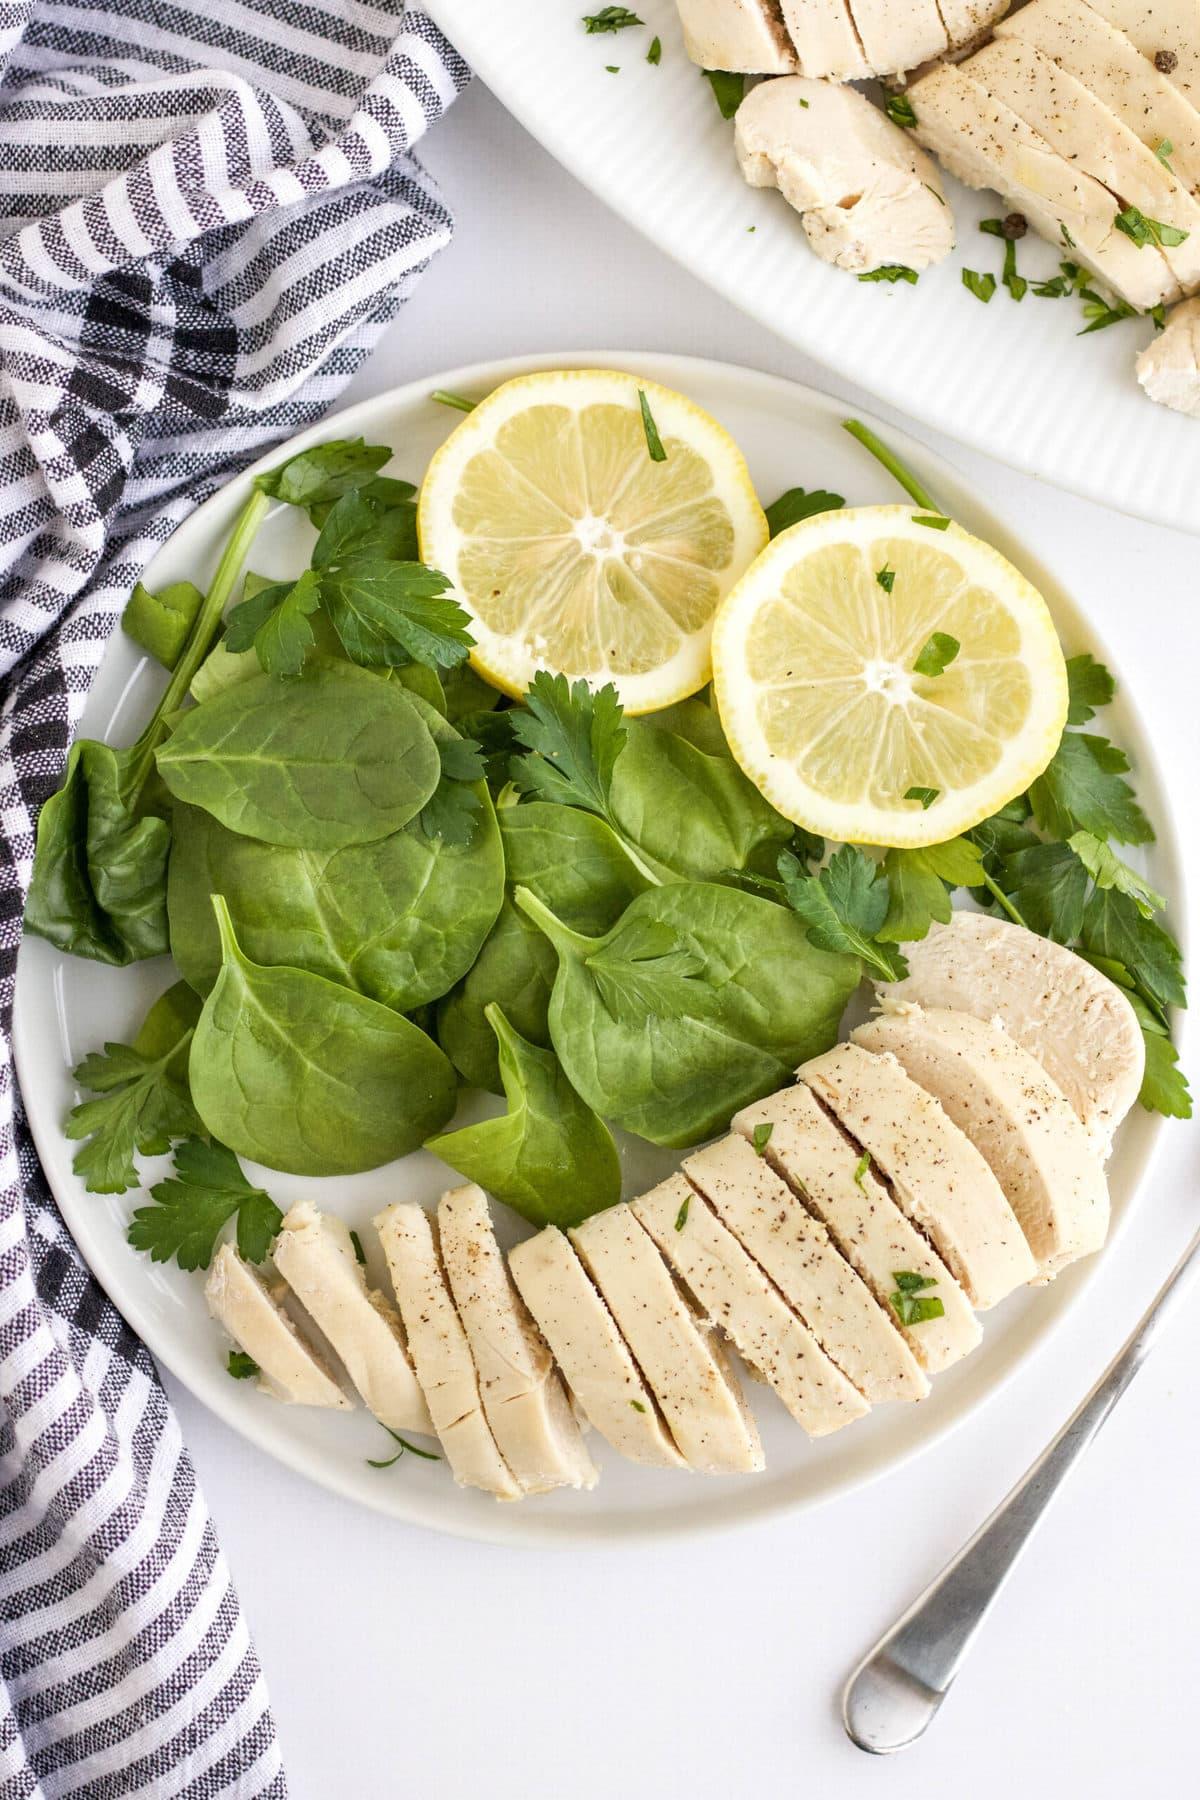 sliced chicken, salad, lemons, blue and white striped napkin